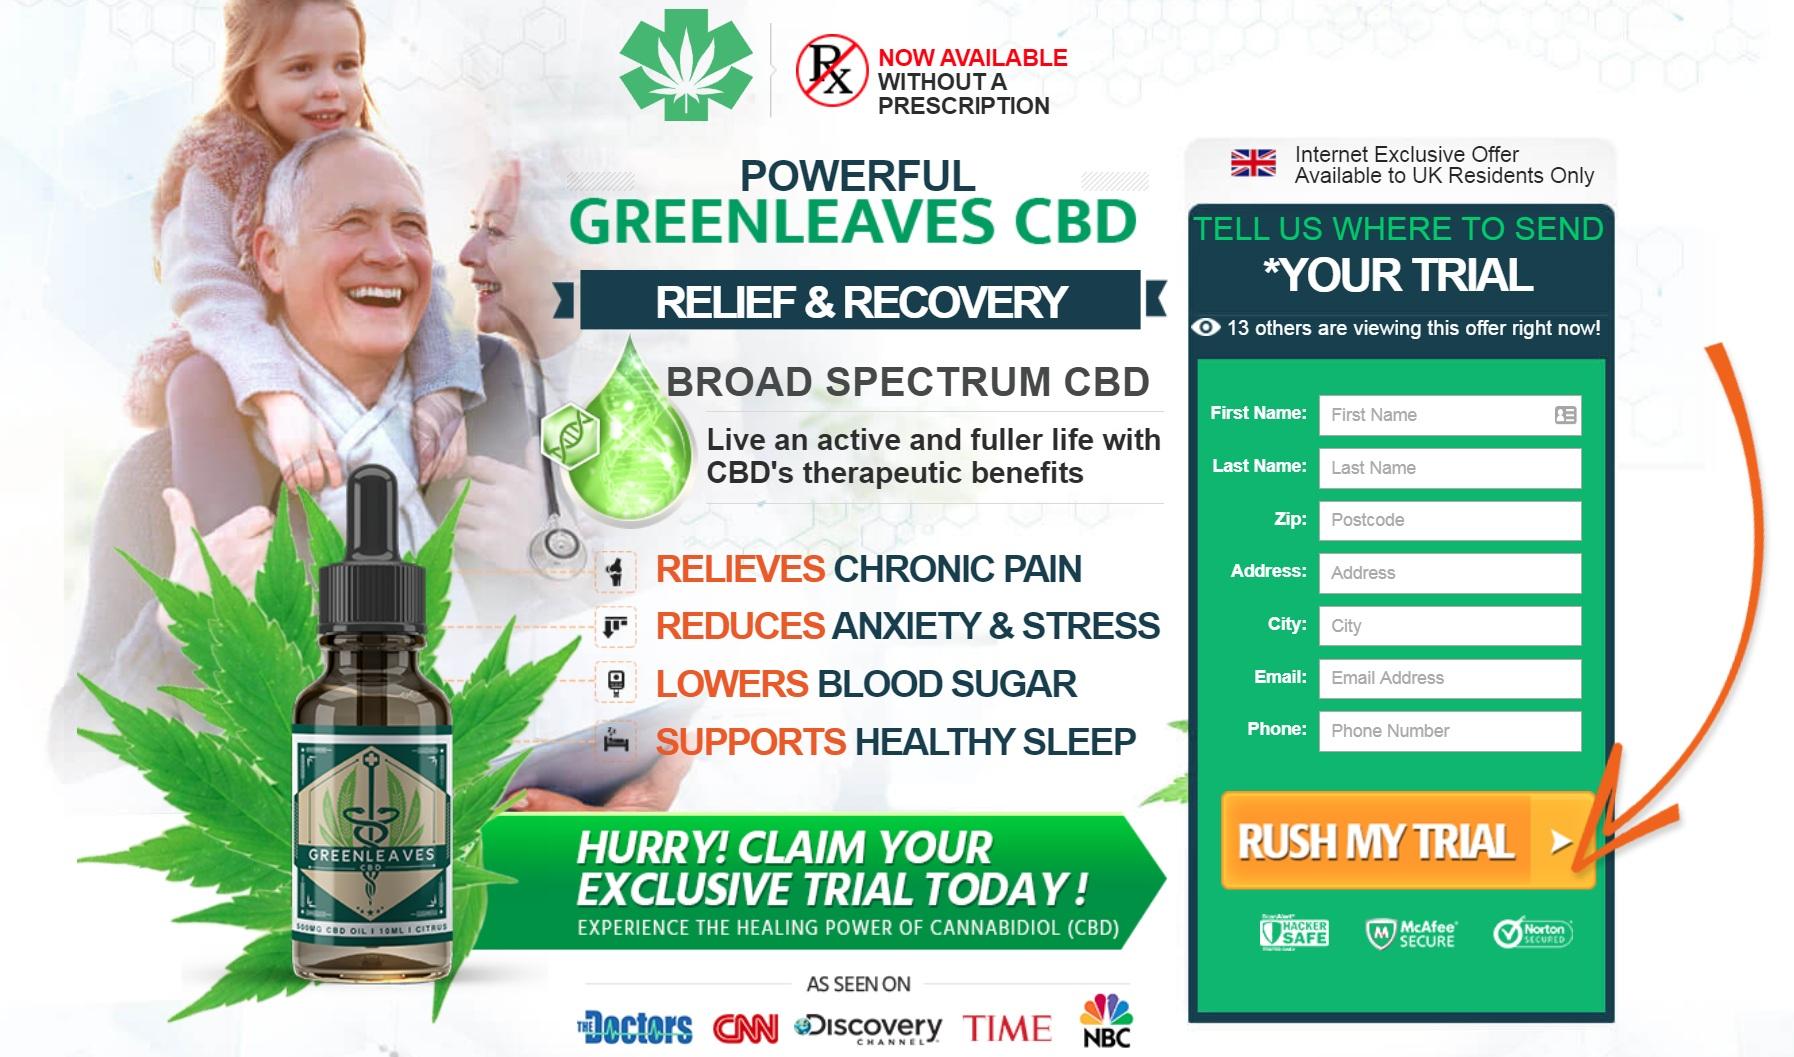 GreenLeaves CBD